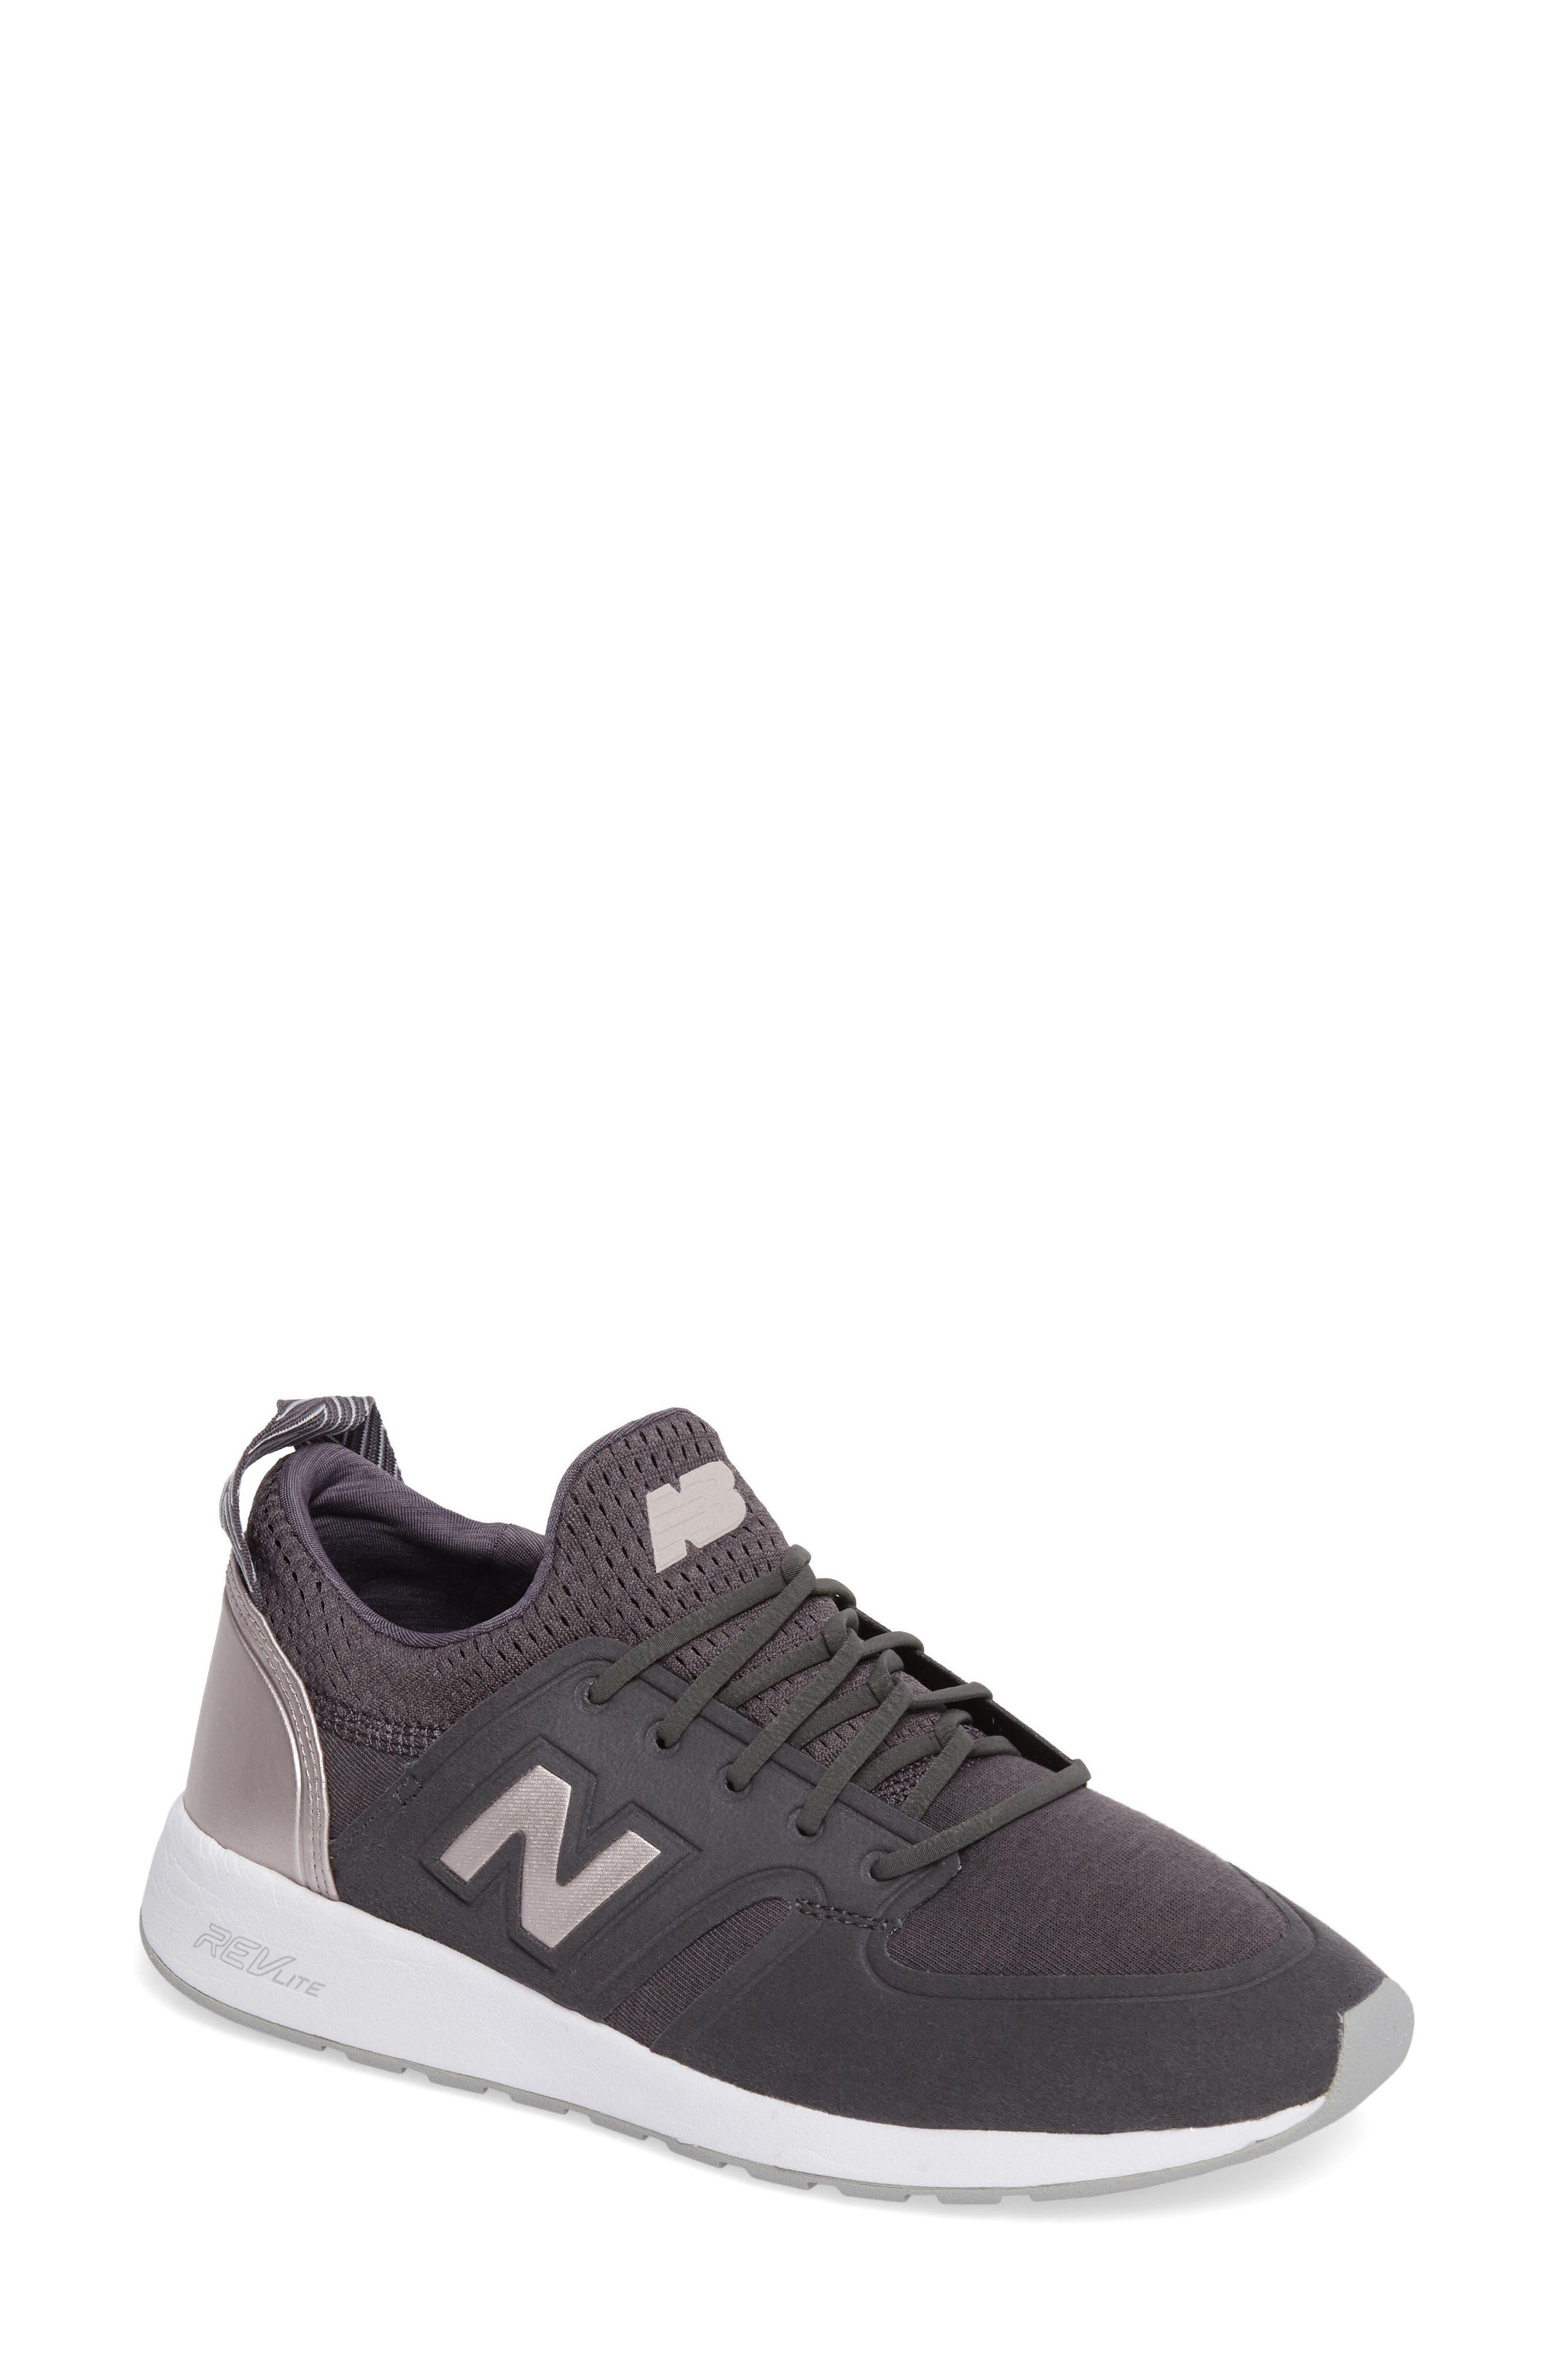 NEW BALANCE, '420' Sneaker, Main thumbnail 1, color, 021